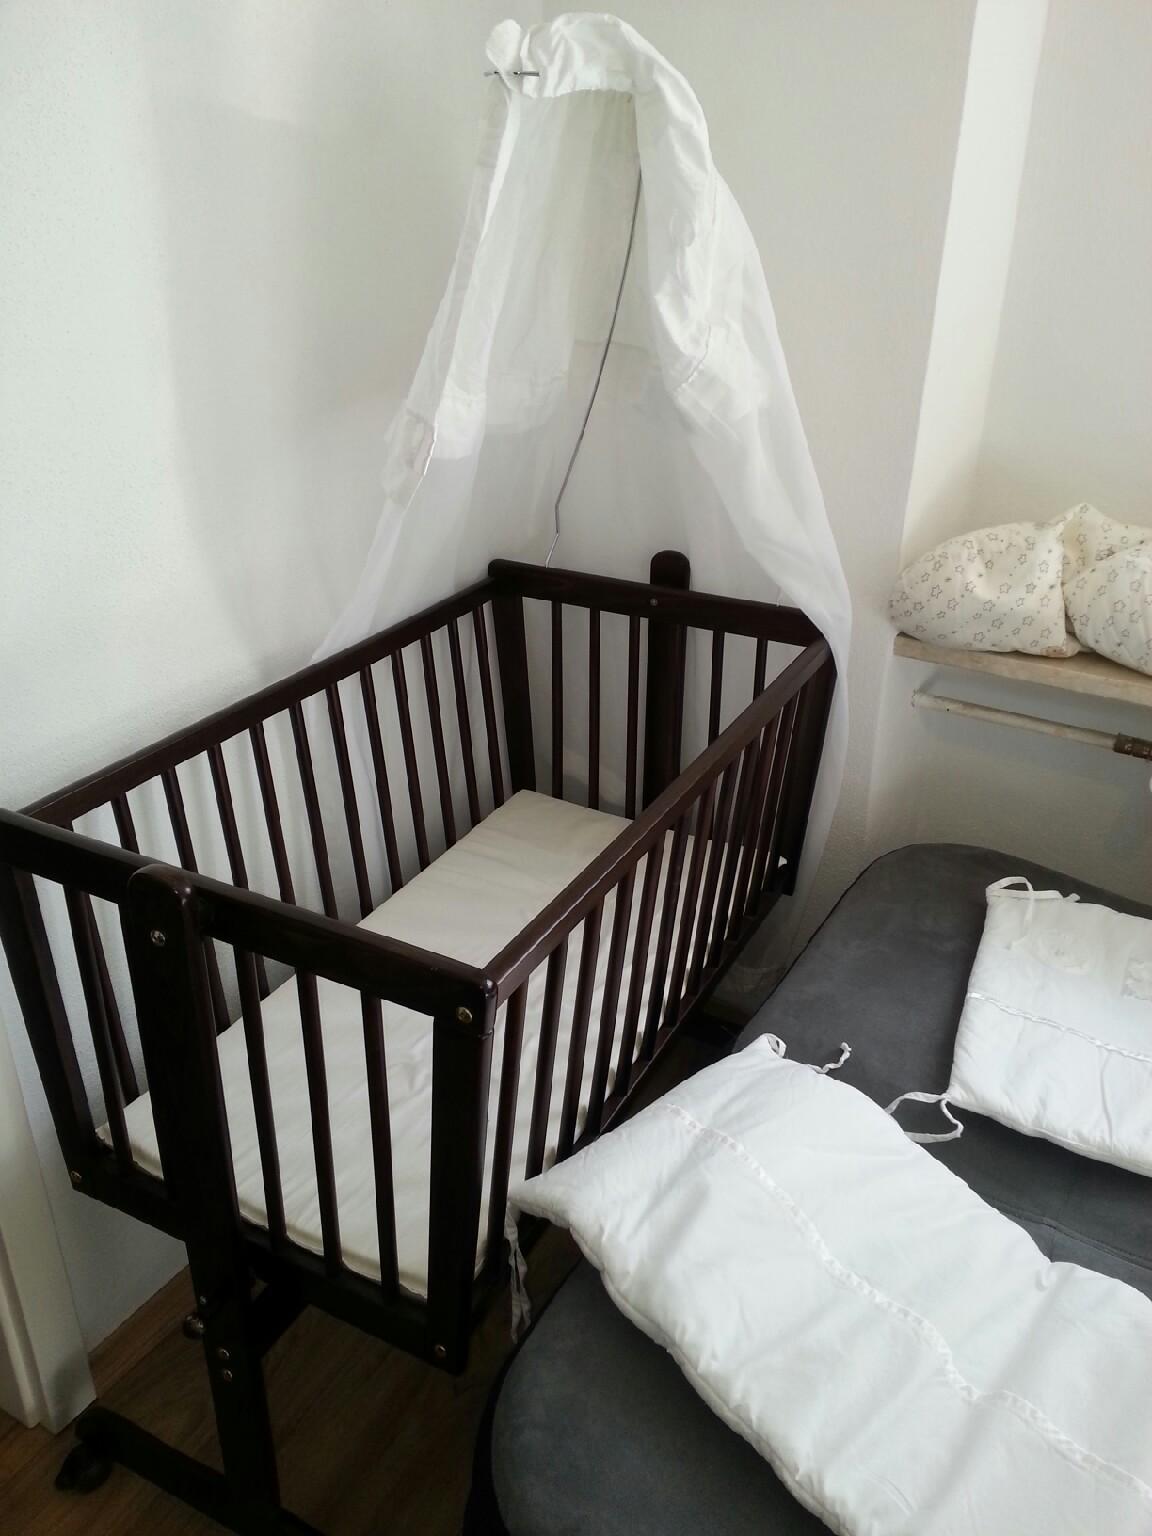 Stubenwagen Garnitur Setting : Gebraucht babywiege kolonial stubenwagen babybett in